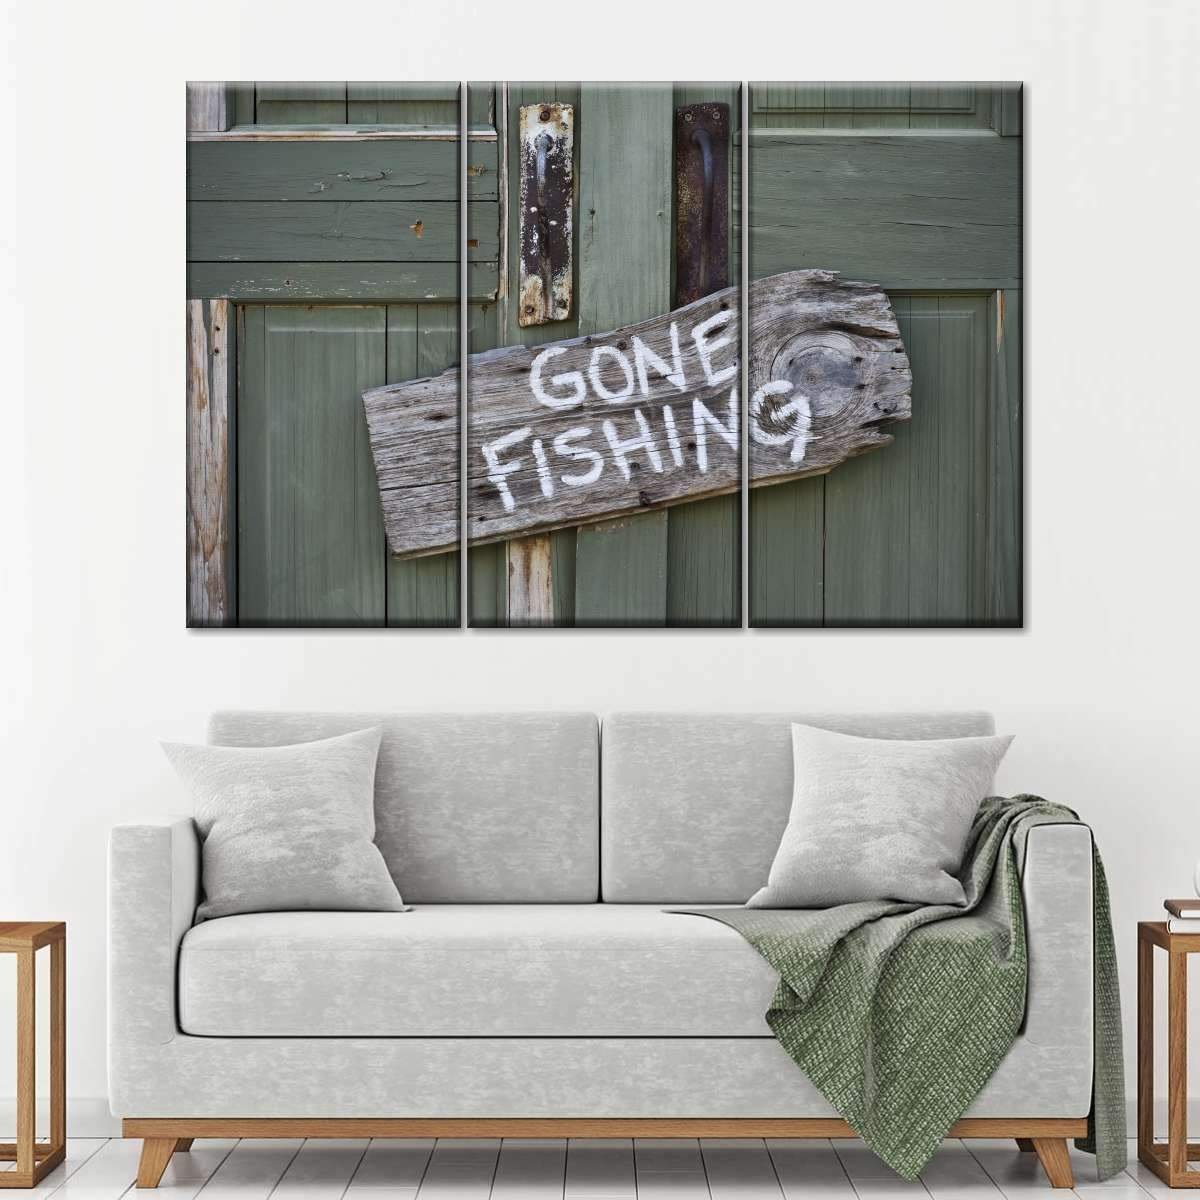 Gone Fishing Multi Panel Canvas Wall Art